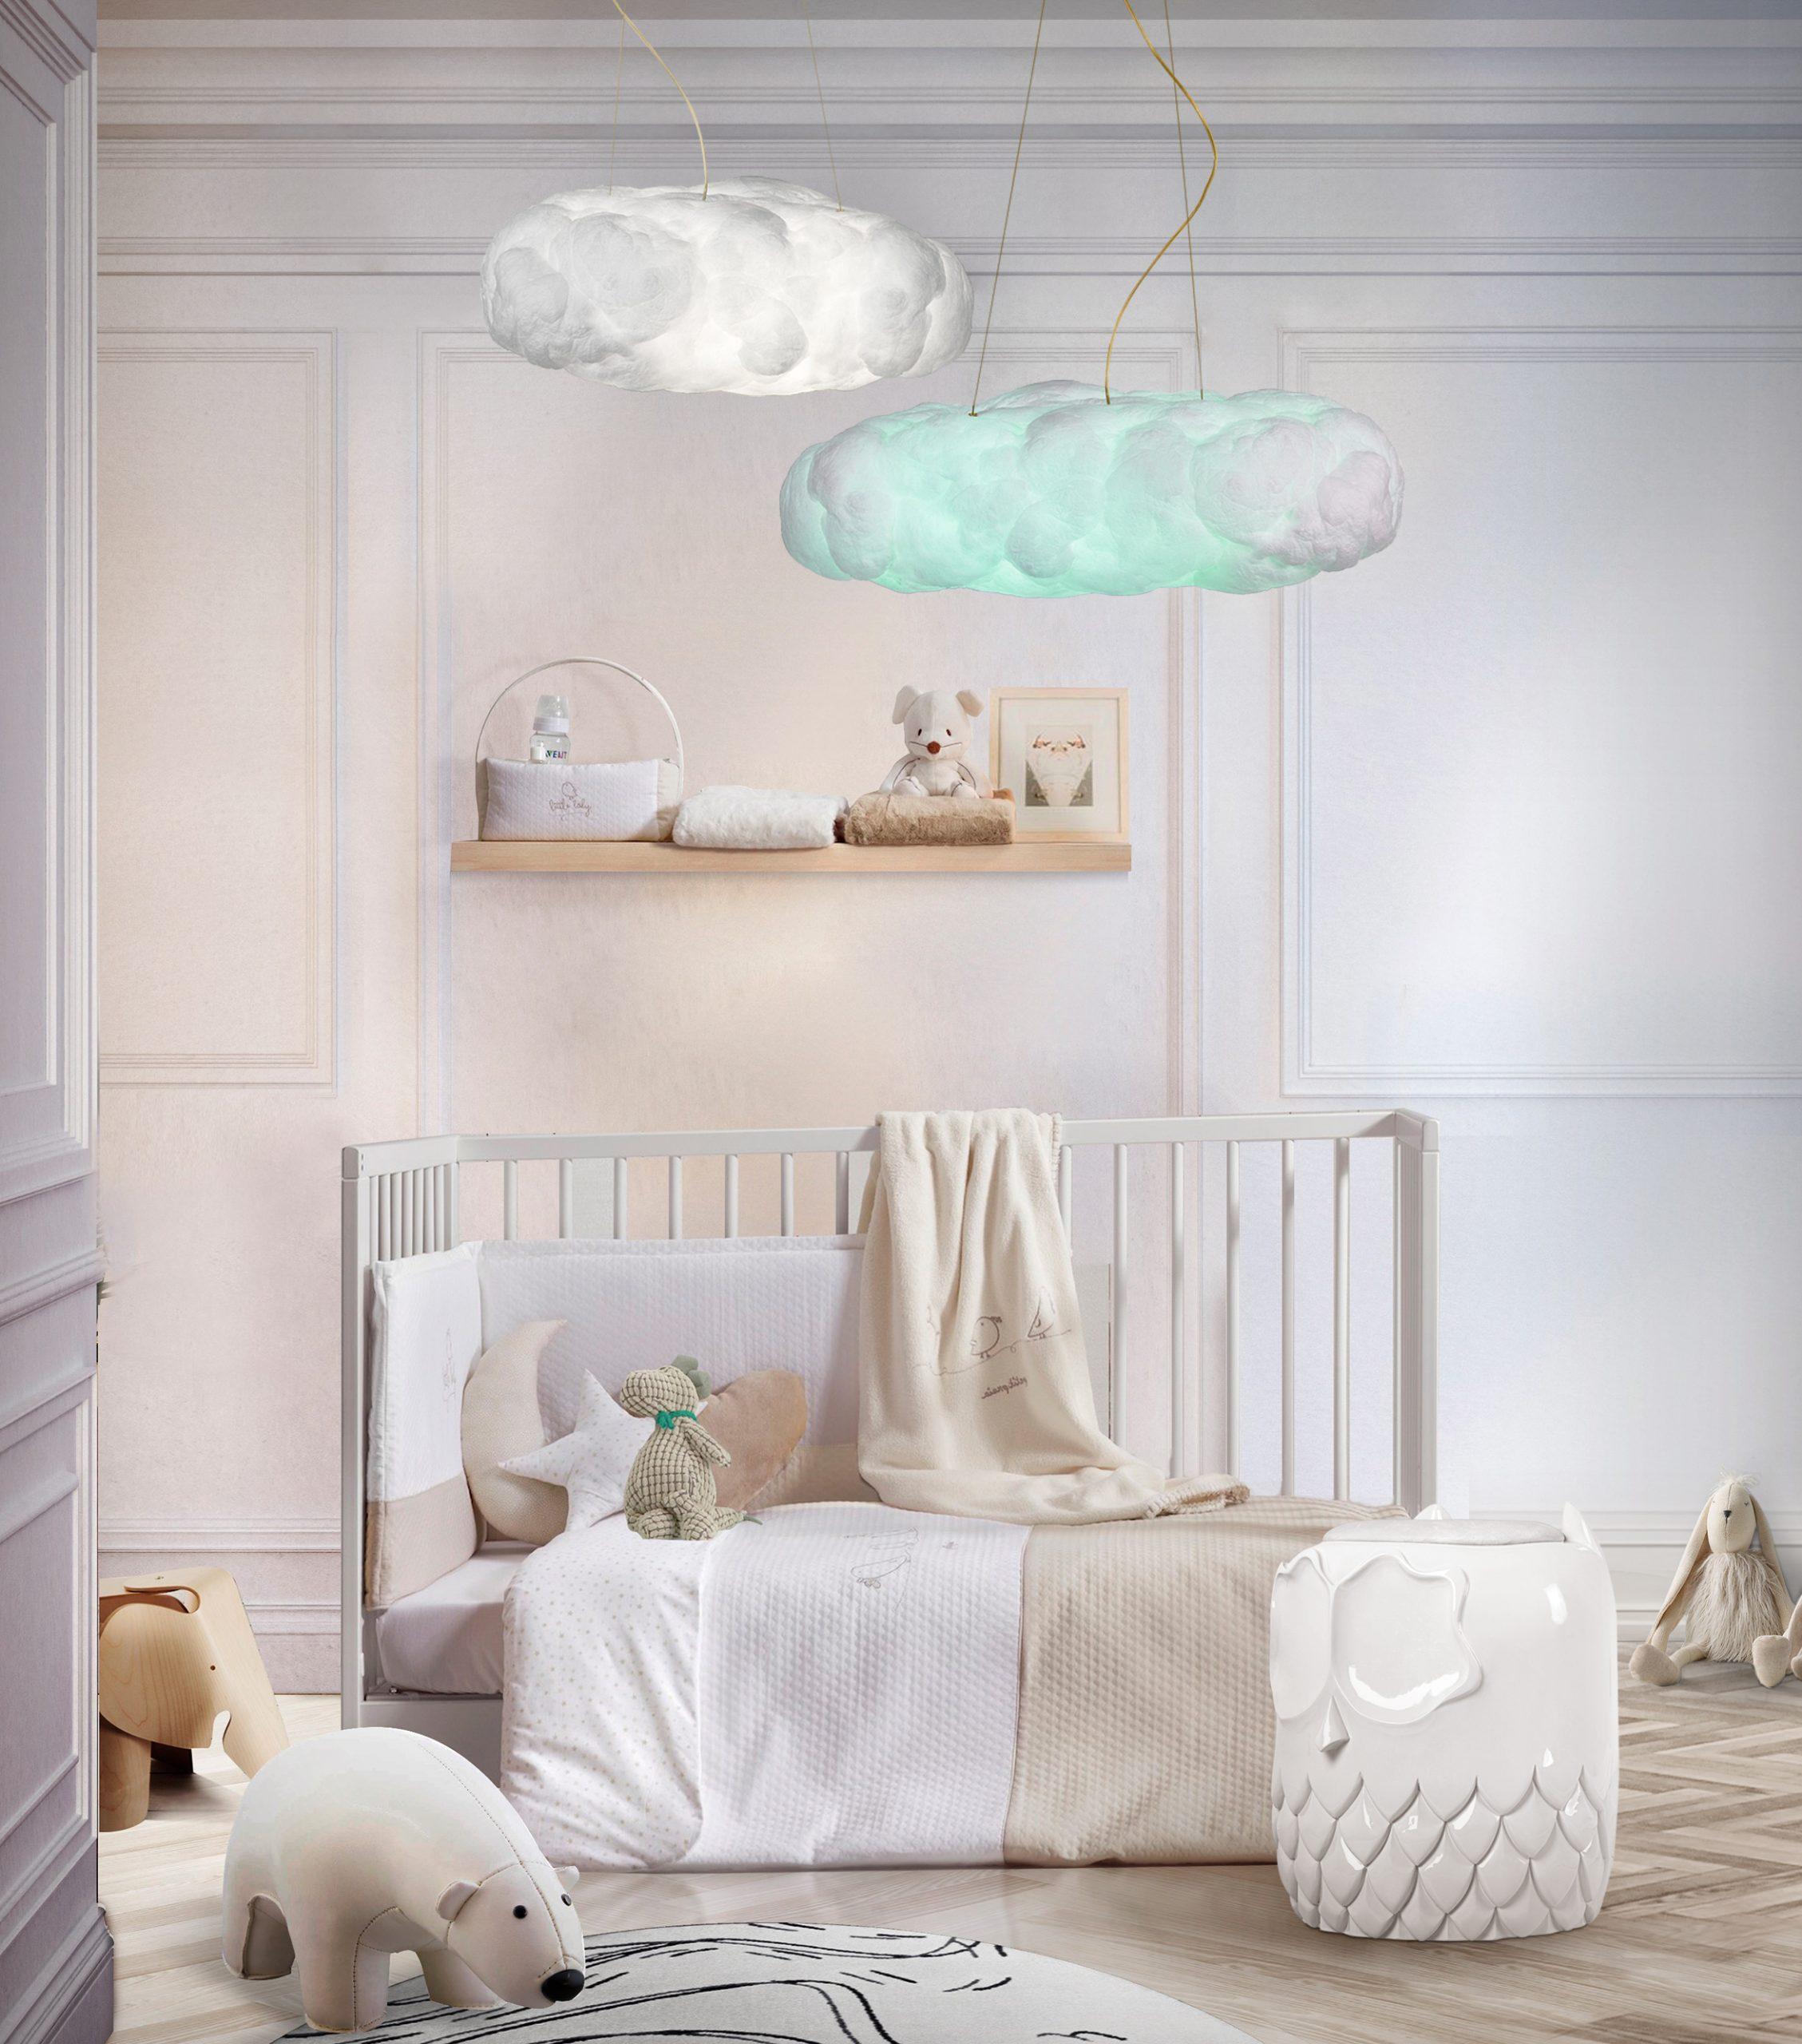 Circu-mocho-stool-cloud-lamp-kids-bedroom